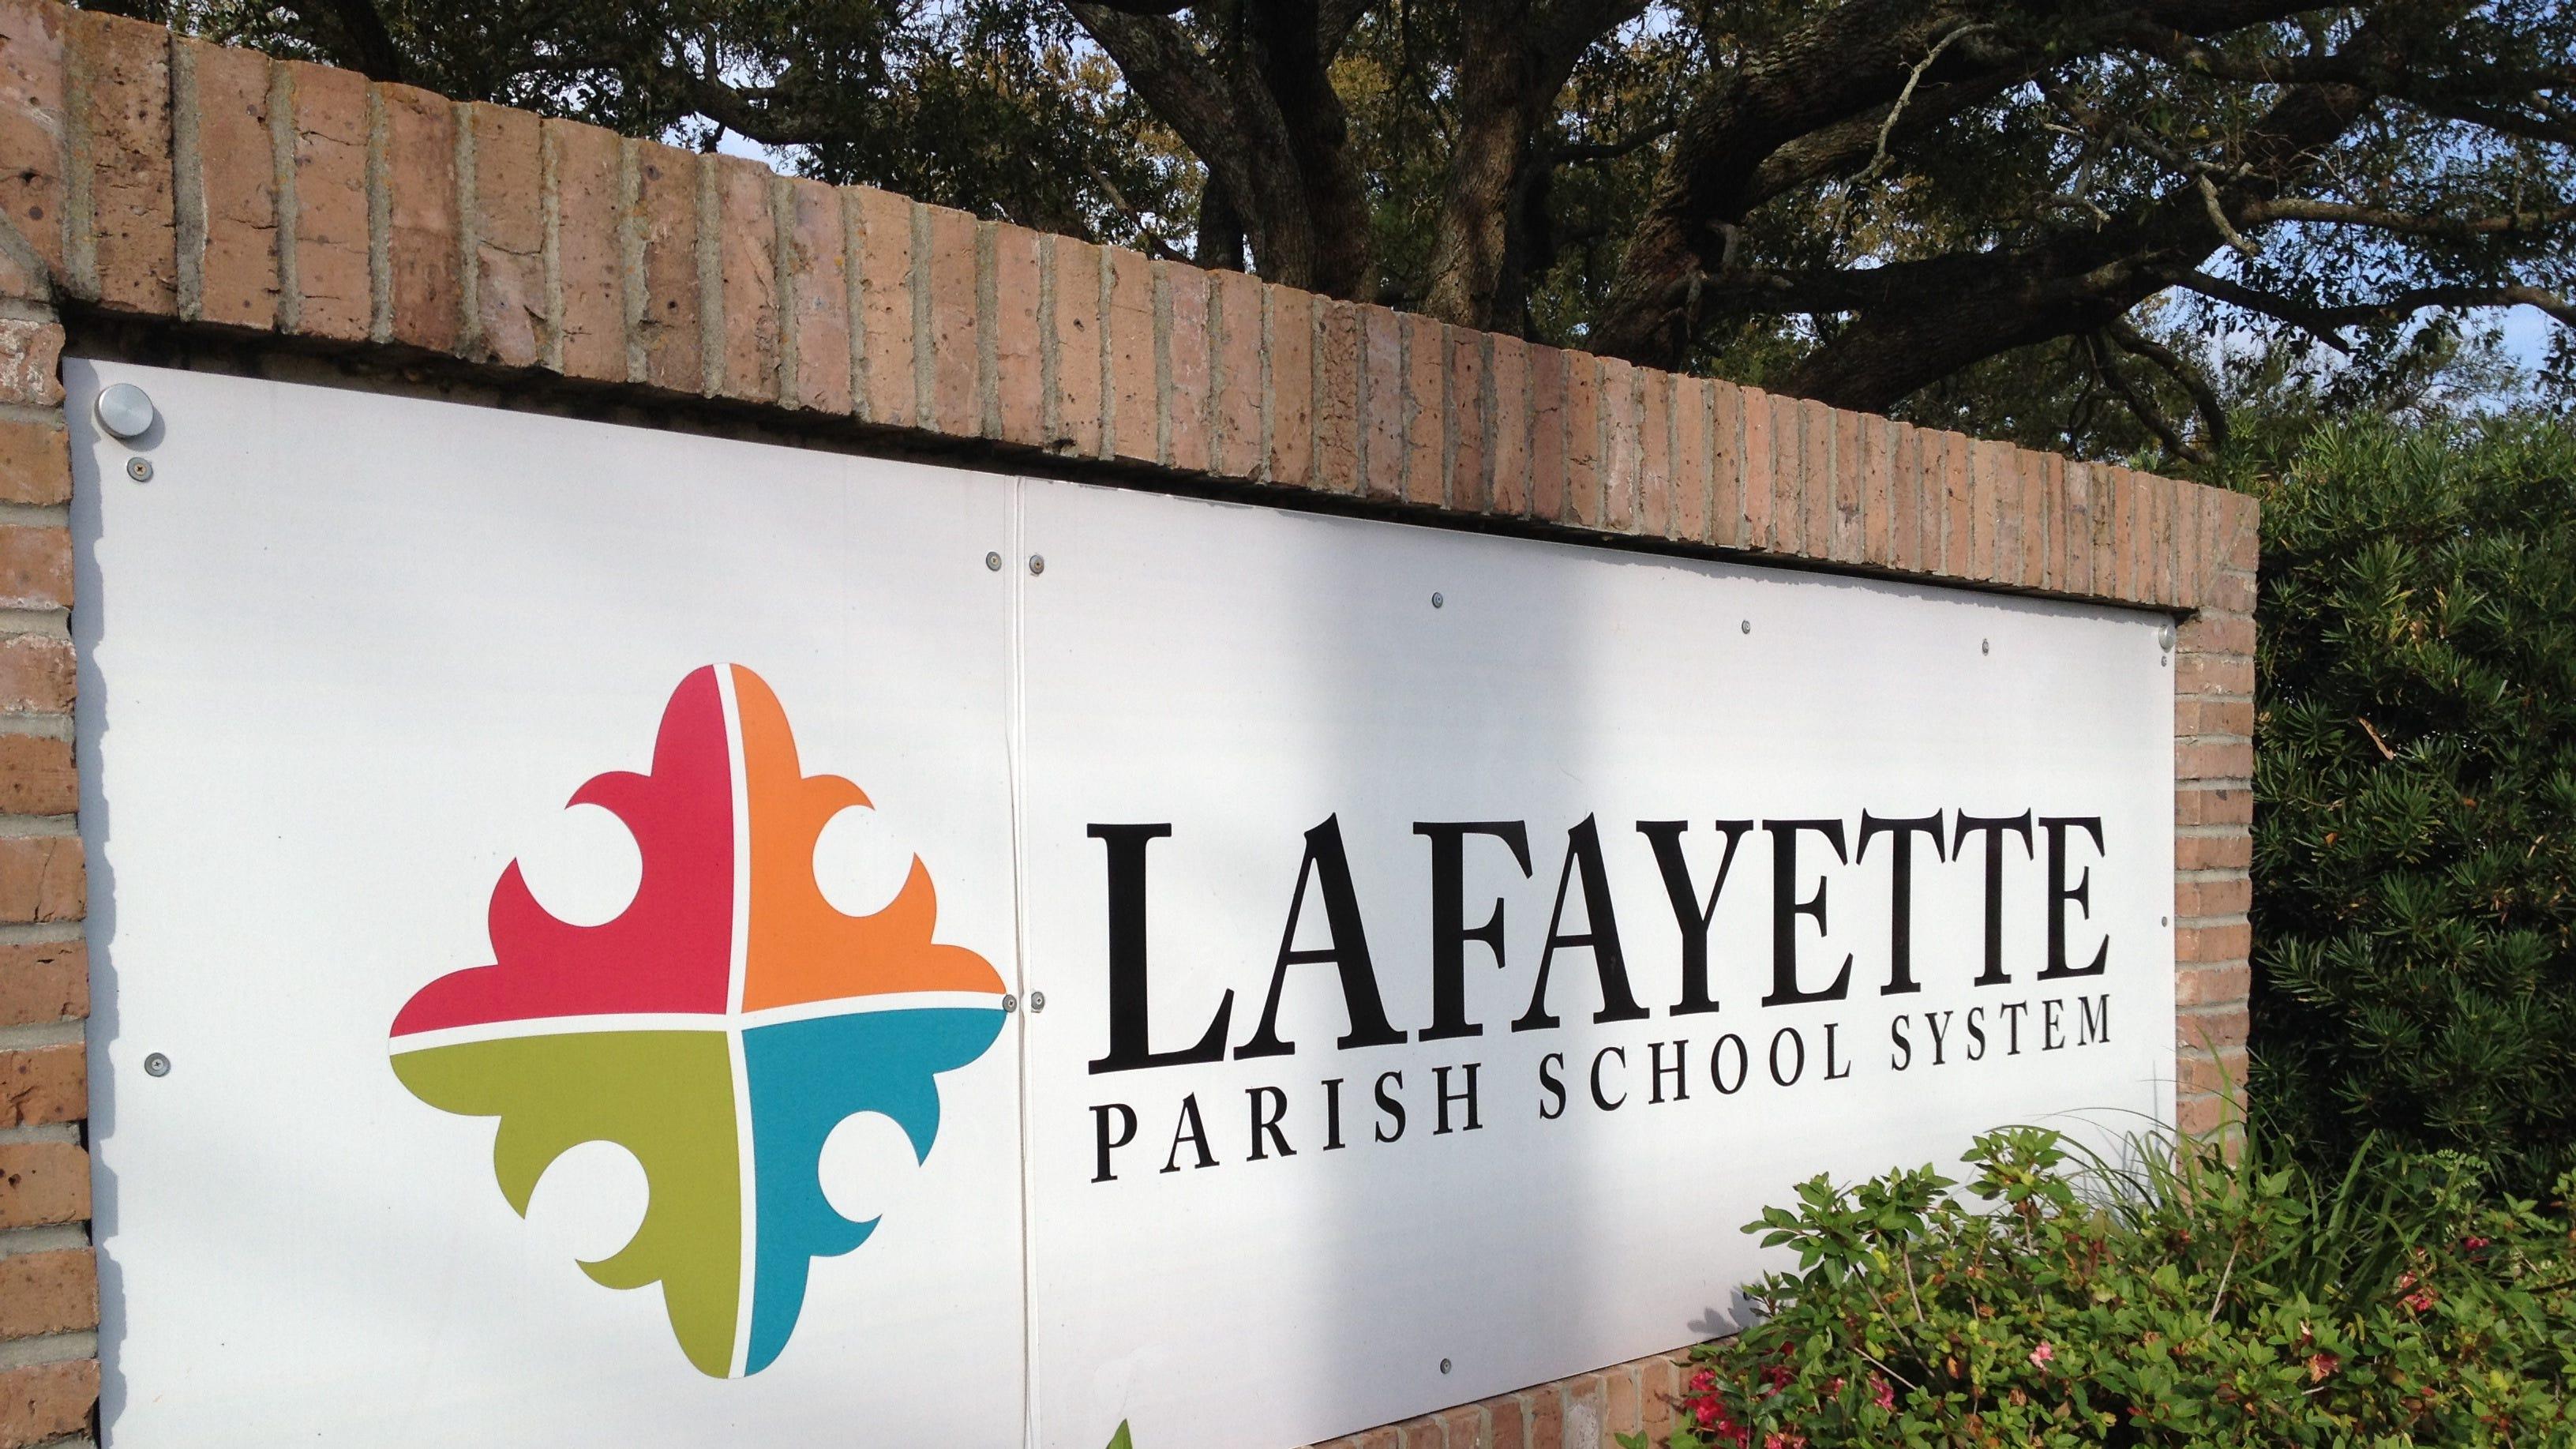 Smithsonian scientists to teach Lafayette Parish classes